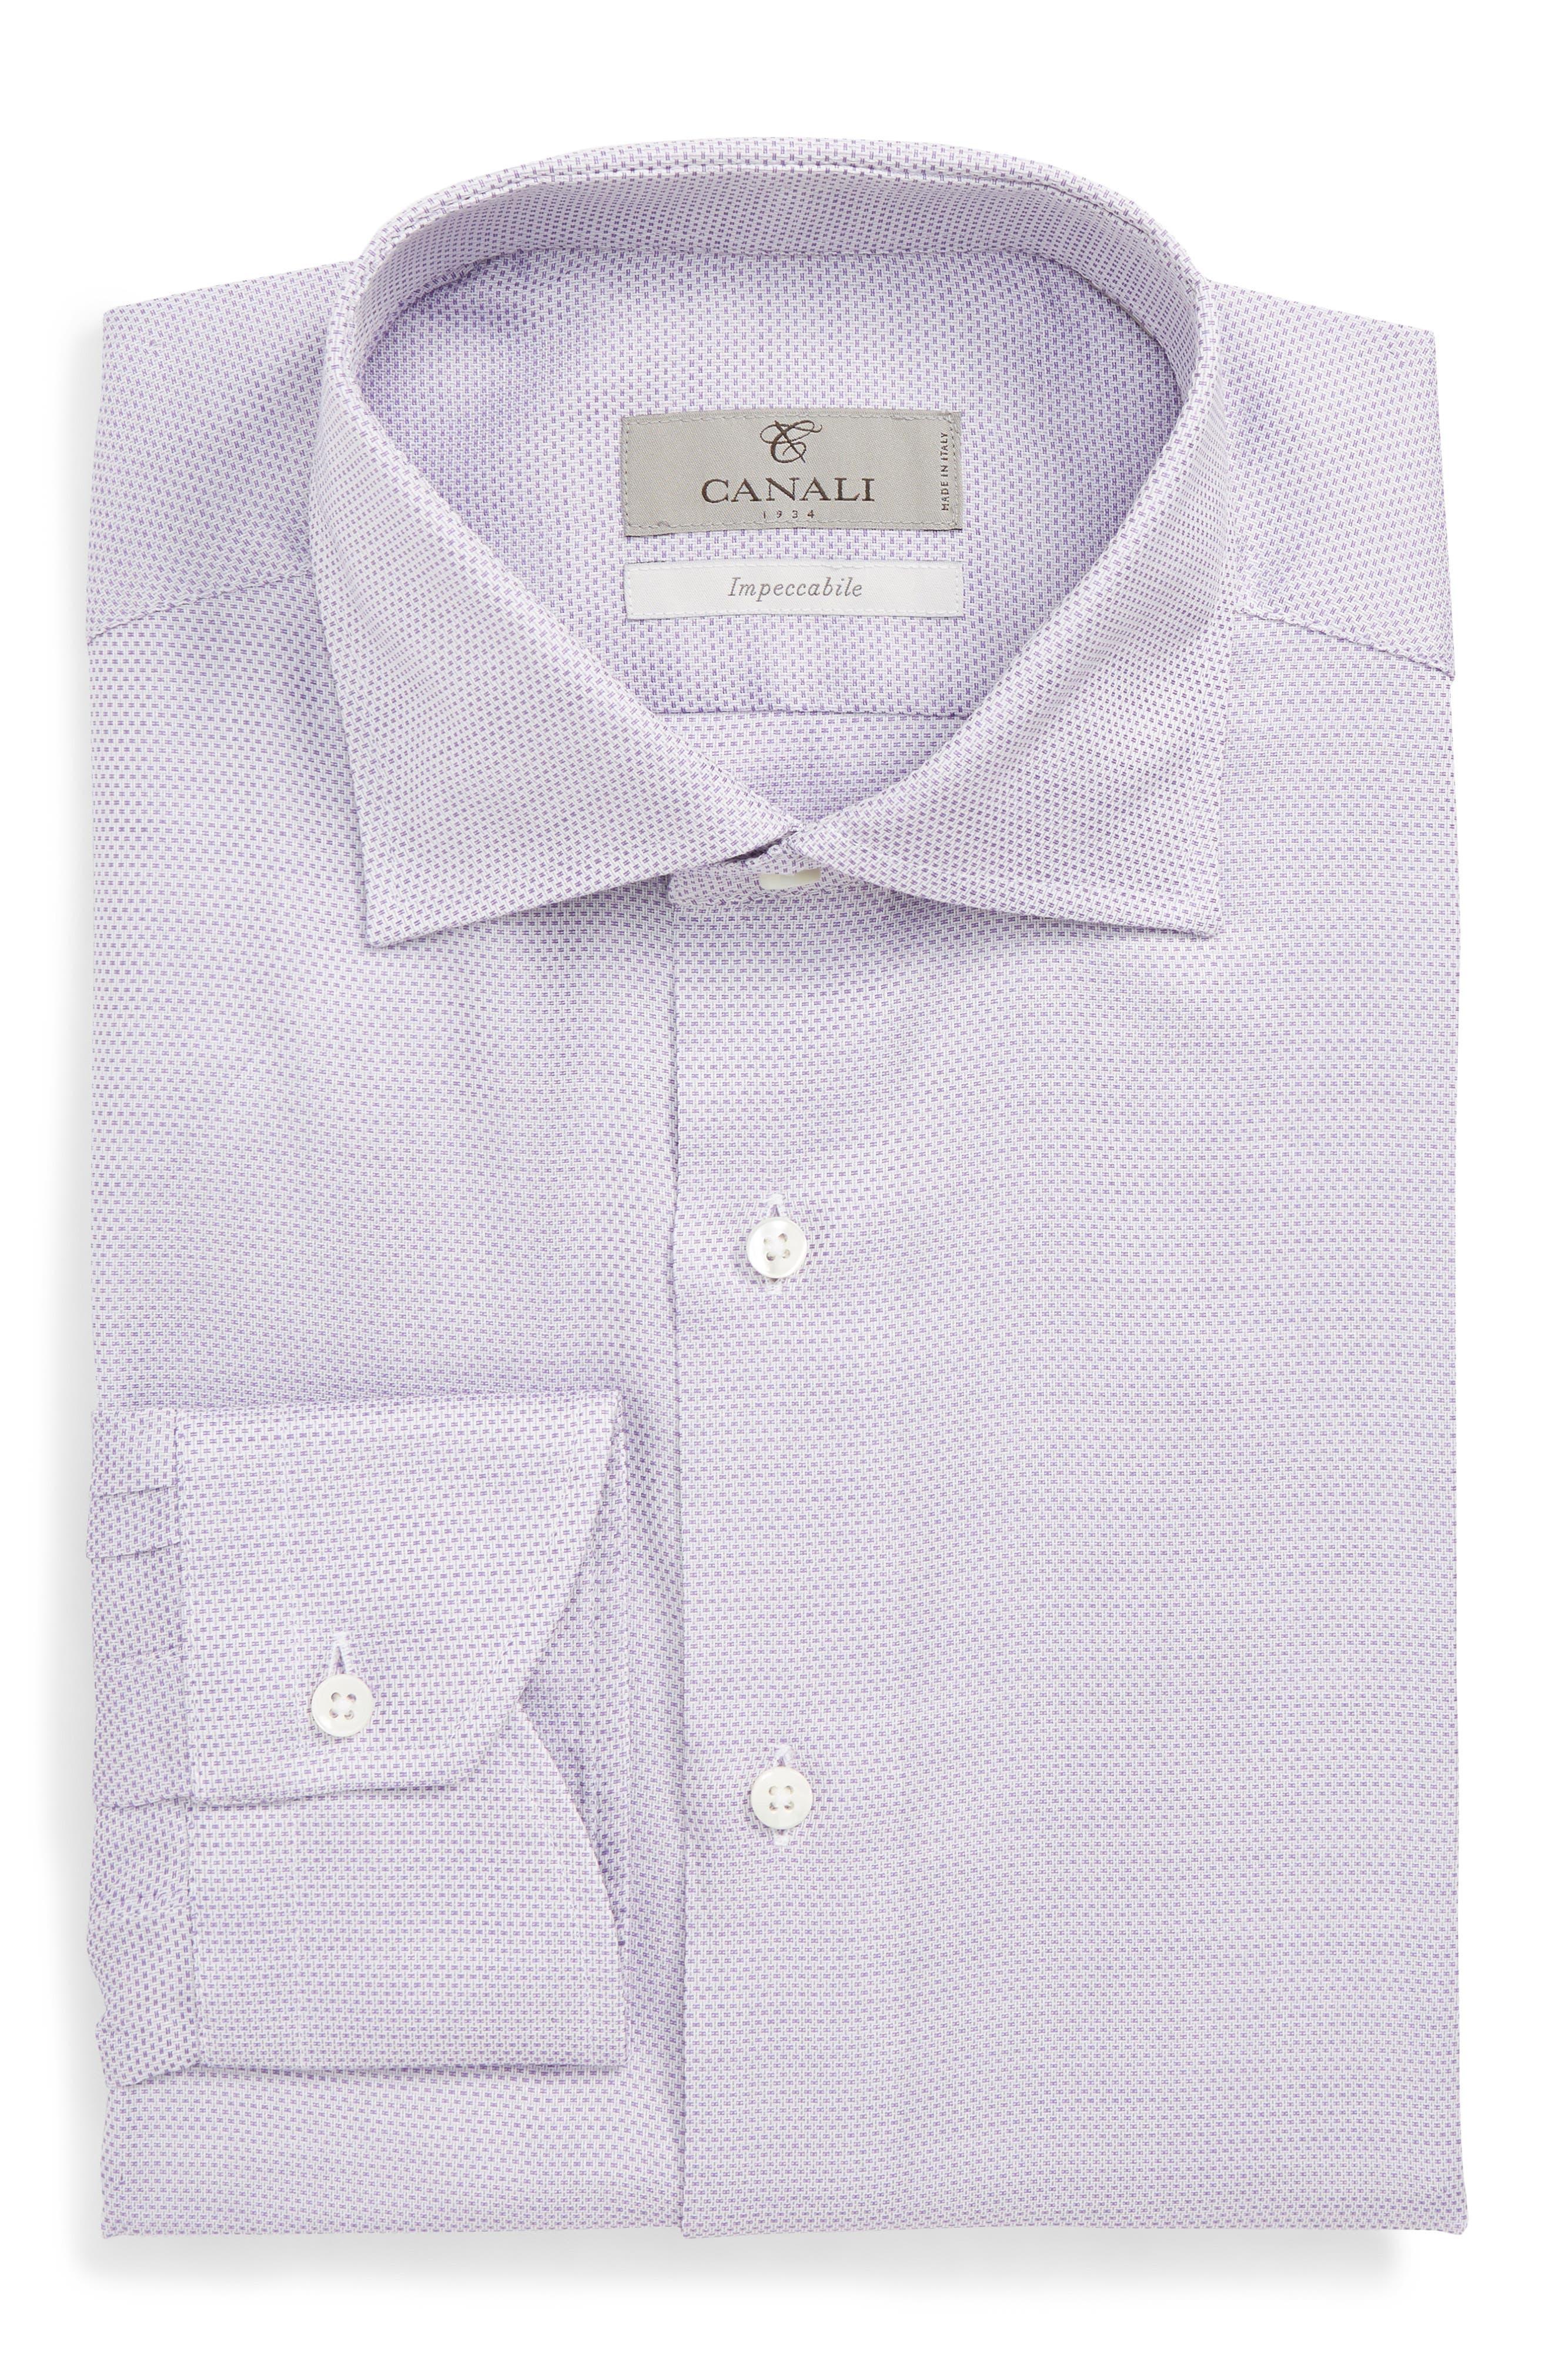 Trim Fit Dress Shirt,                             Alternate thumbnail 6, color,                             LIGHT PURPLE